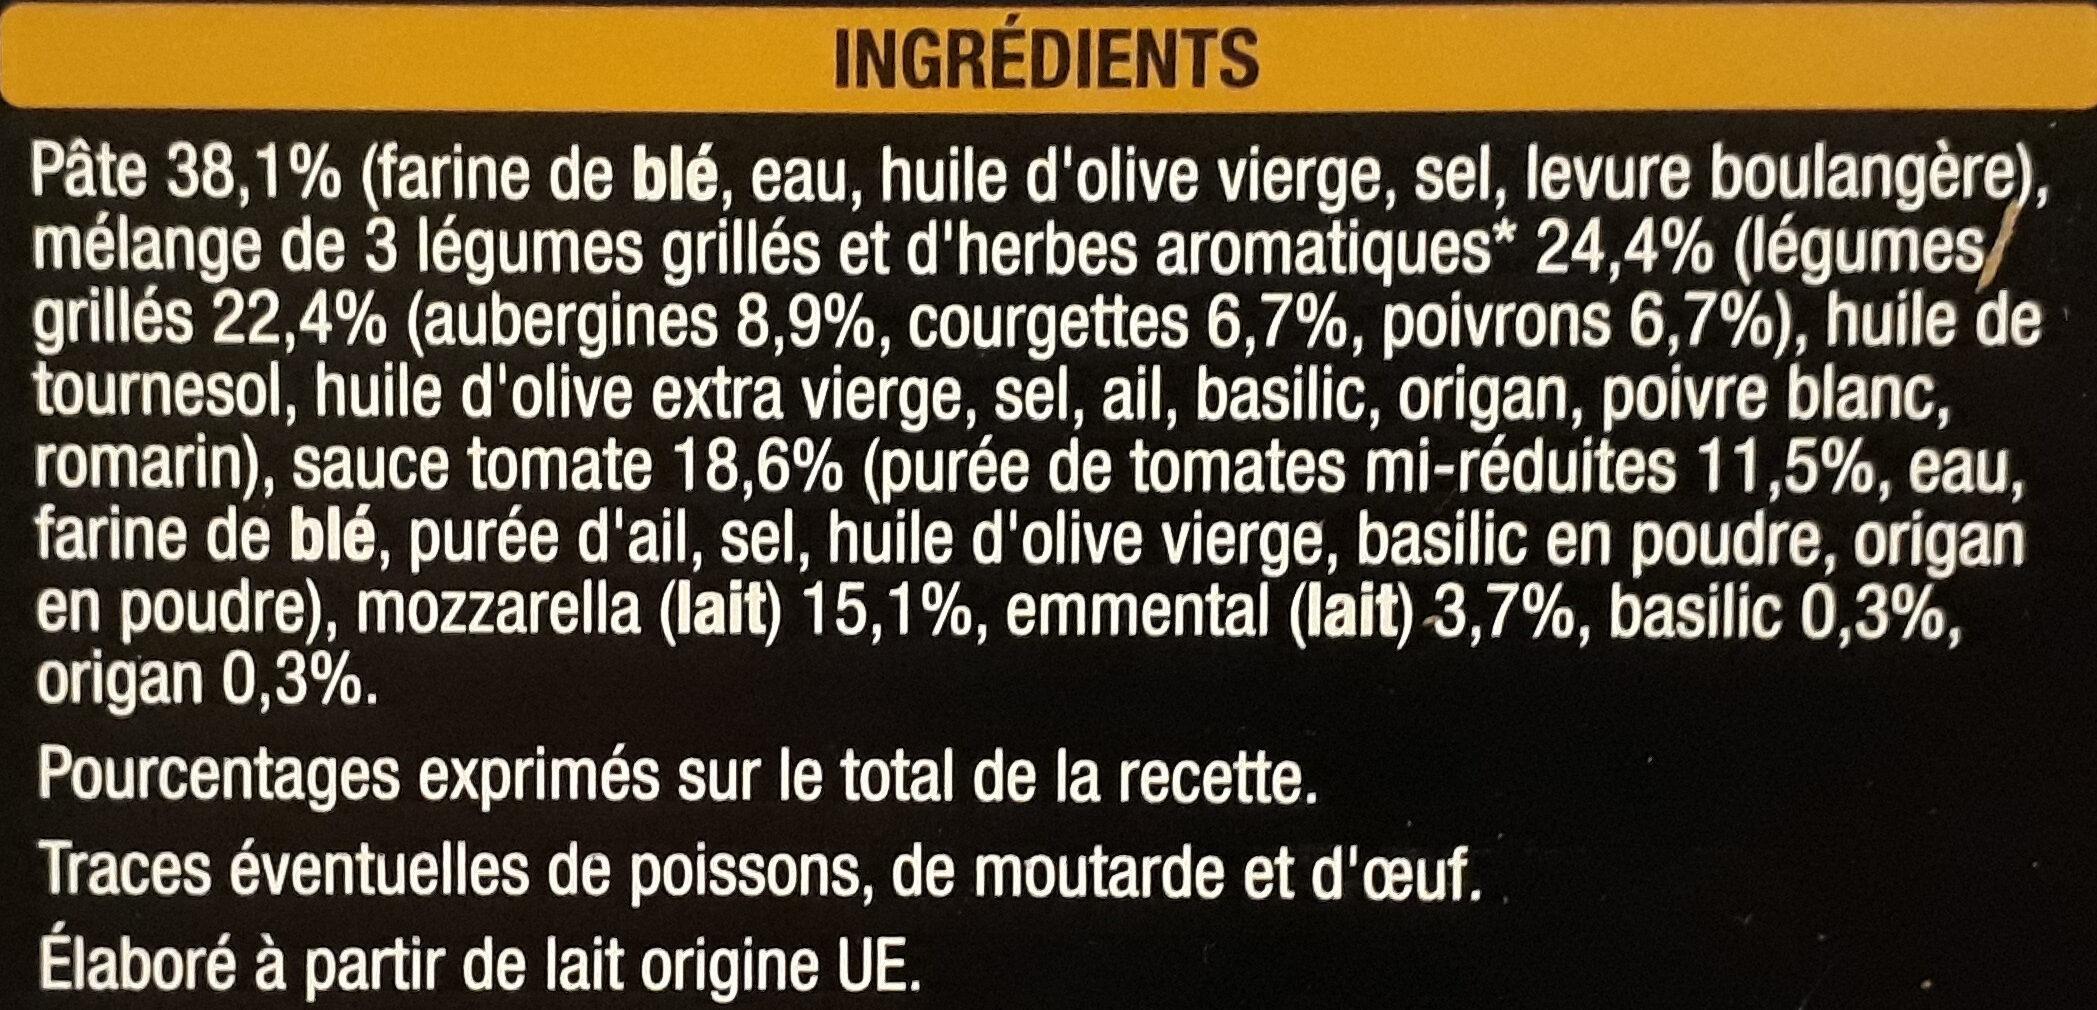 Pizza Primavera - légumes grillés et mozzarella - Ingredients - fr